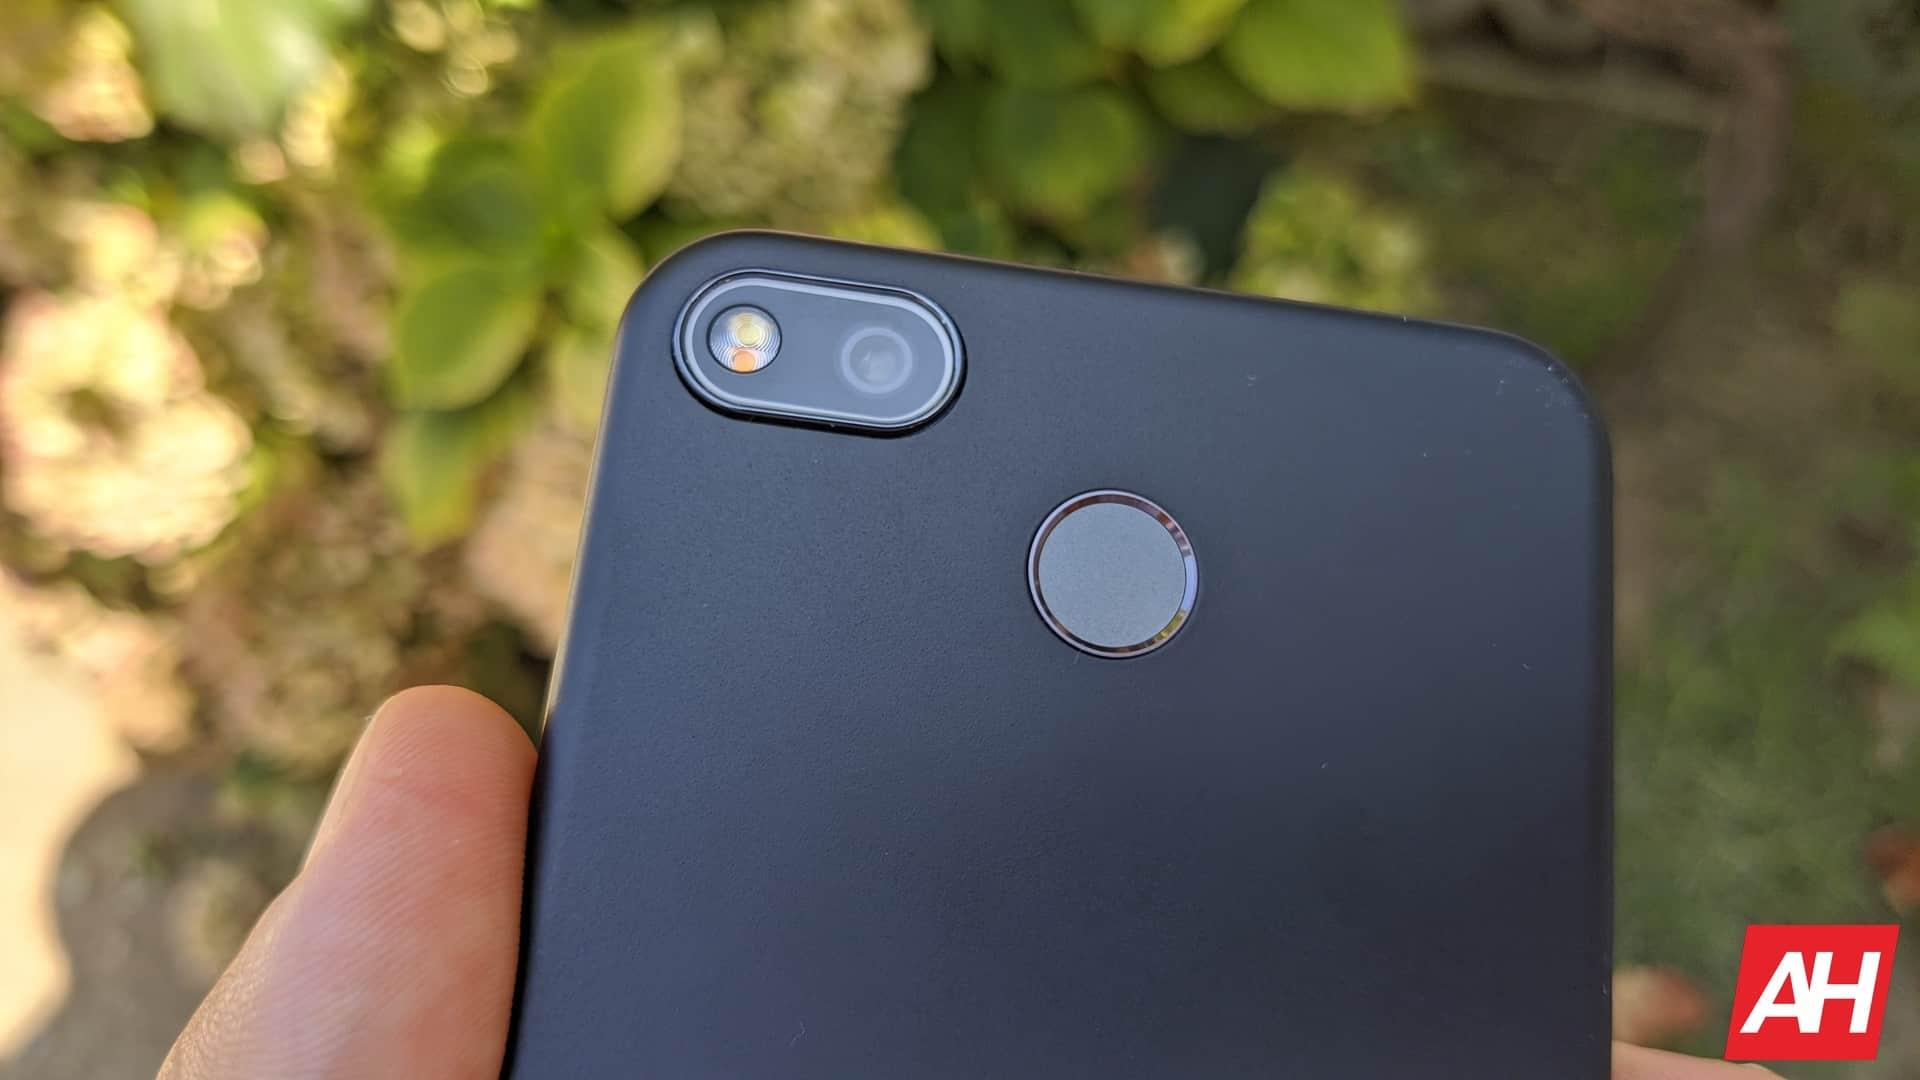 AH Fairphone 3 Plus image 32